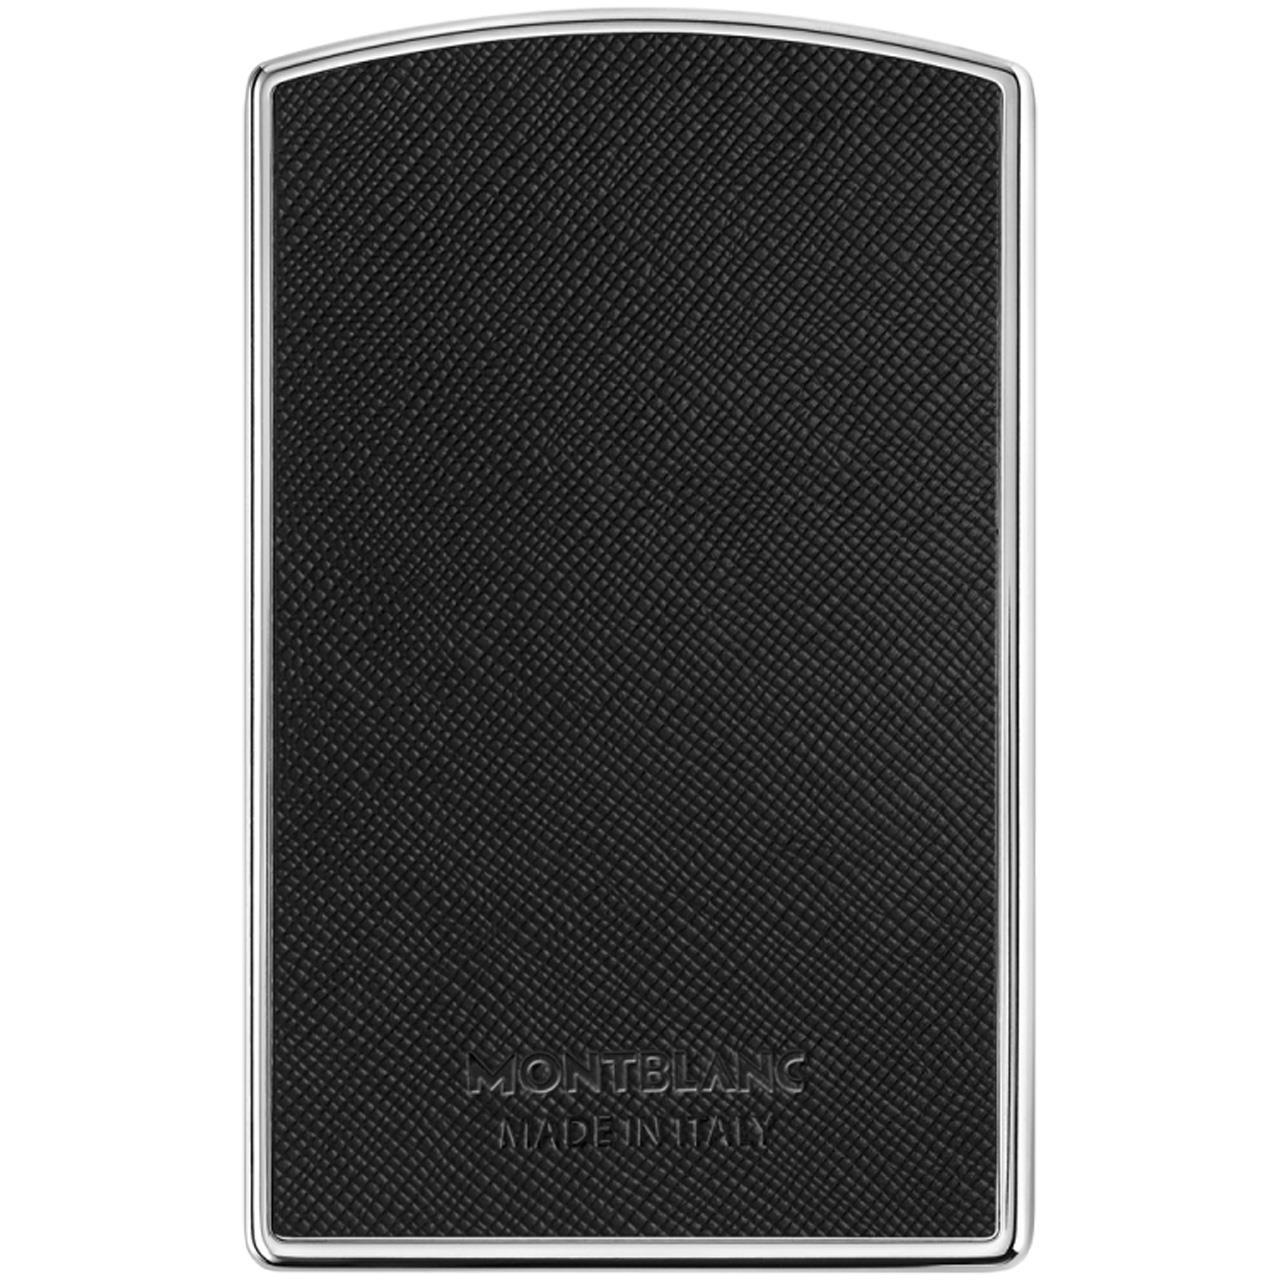 Business Card Holder Hard Shell Sartorial Black